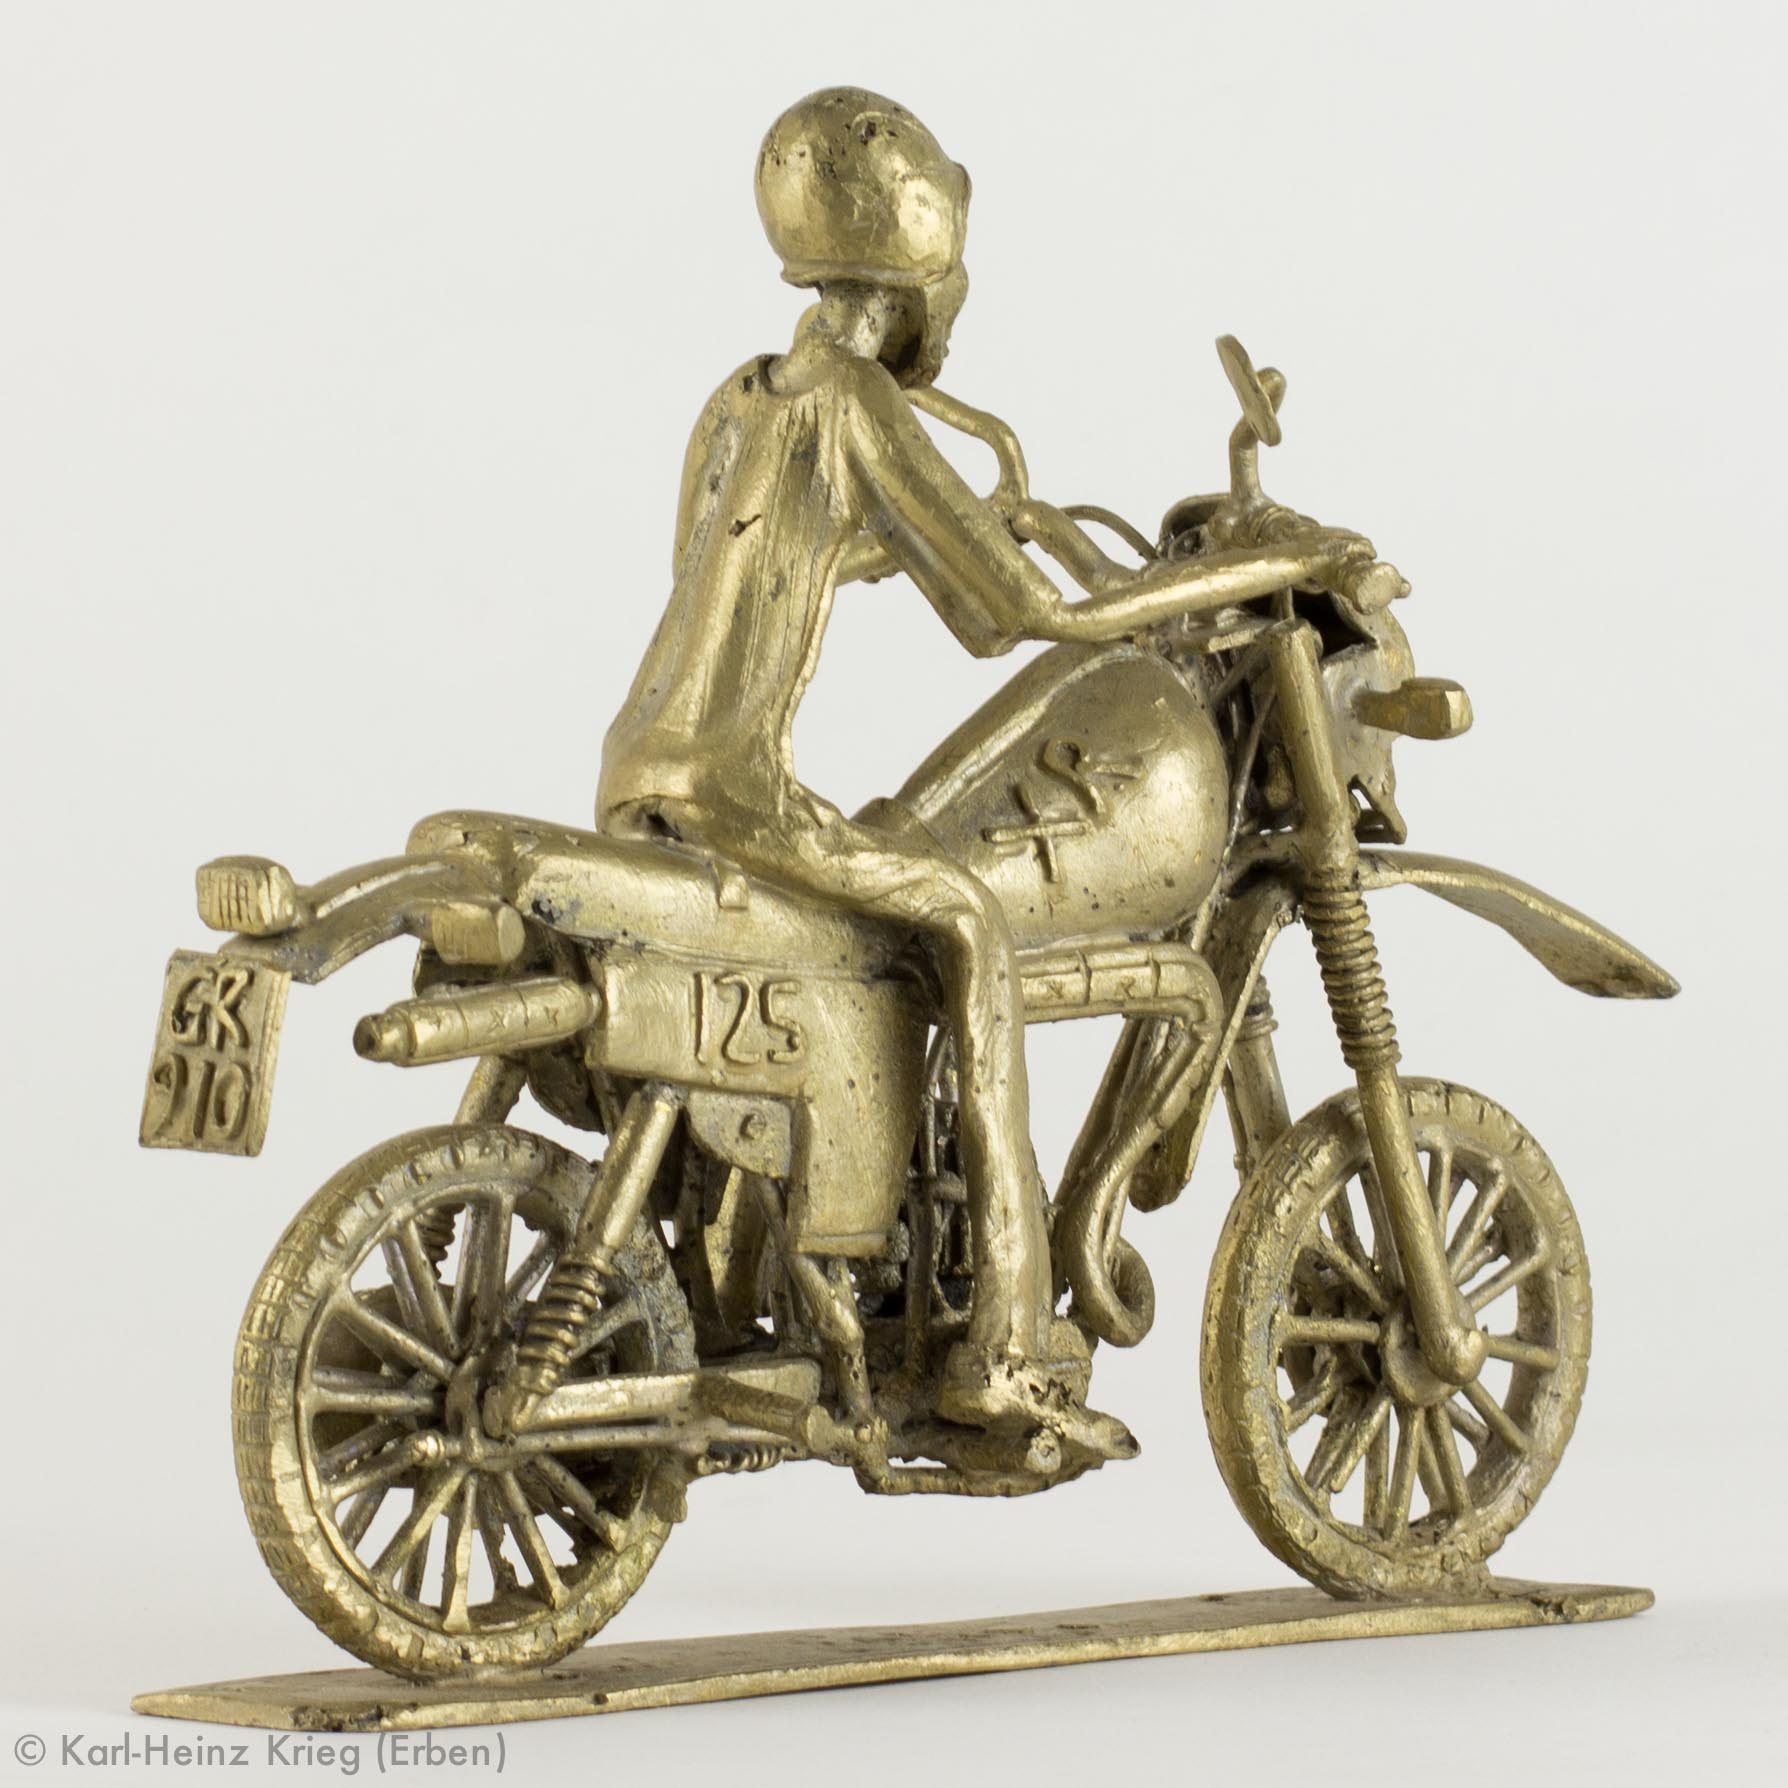 Skulptur von Yaw Amankwaa verkauft